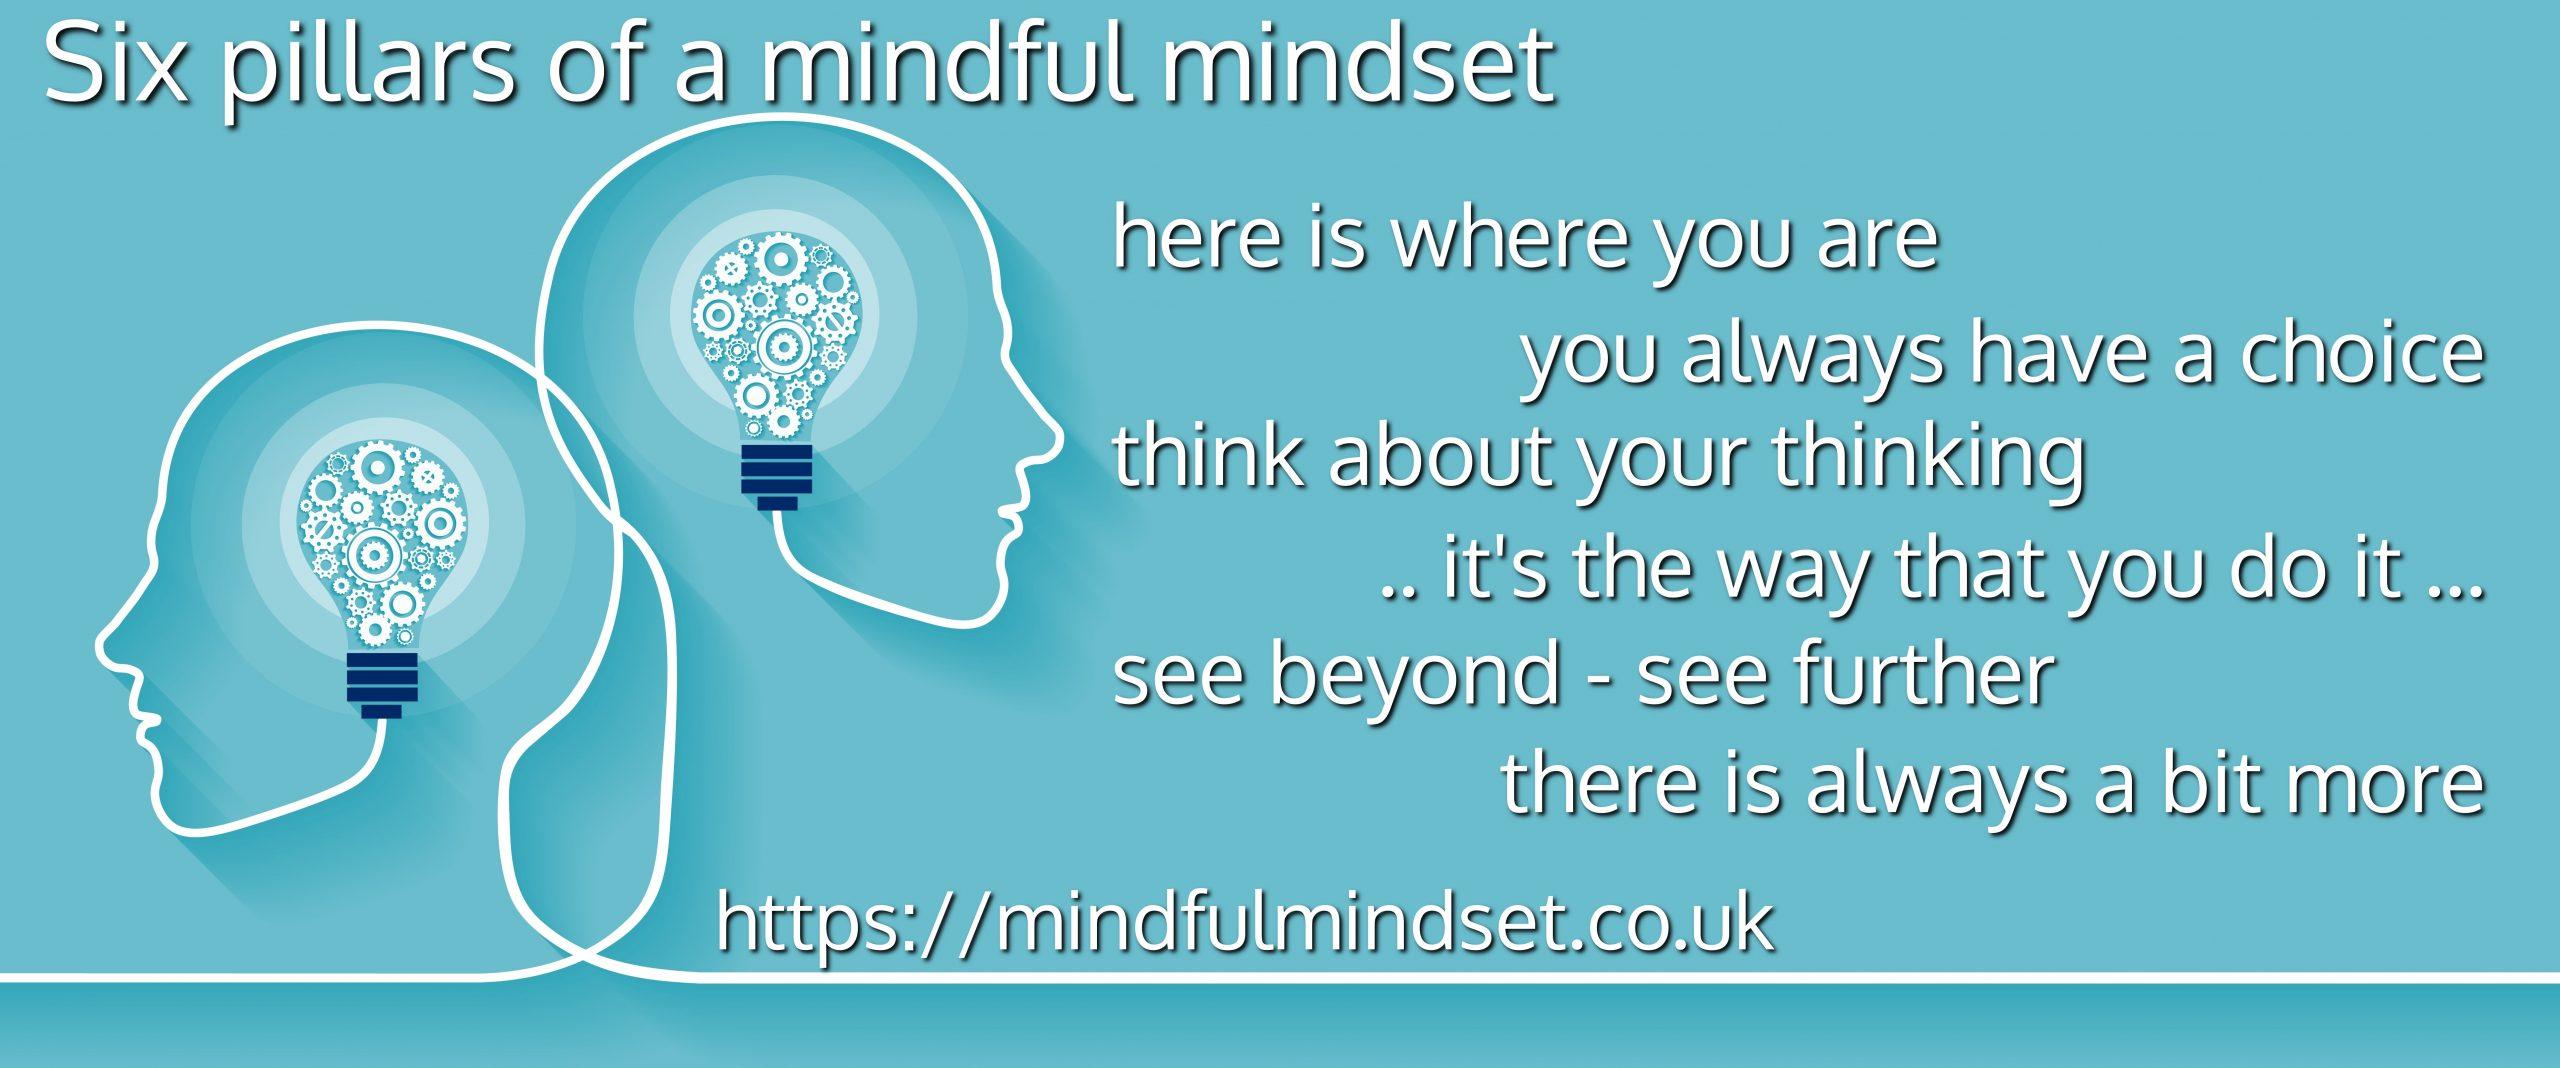 Six pillars of a mindful mindset